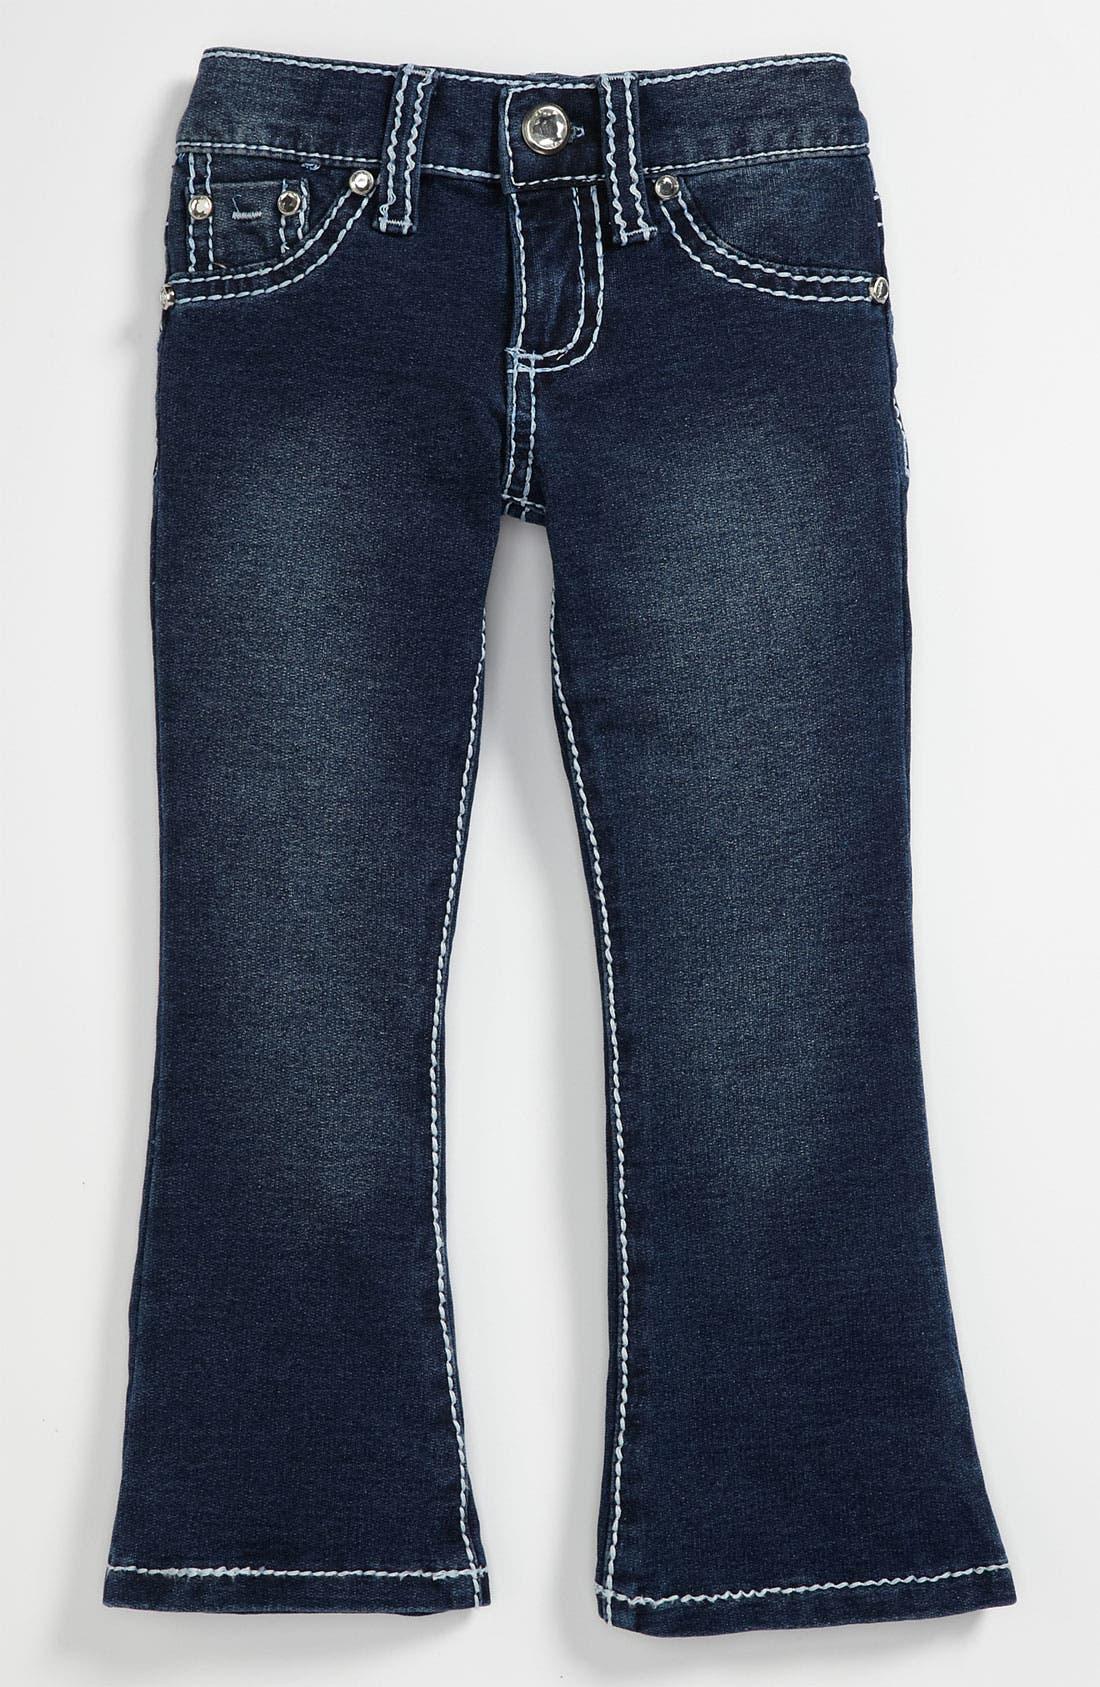 Alternate Image 2  - Tractr 'Heart Pocket' Flare Pants (Toddler)